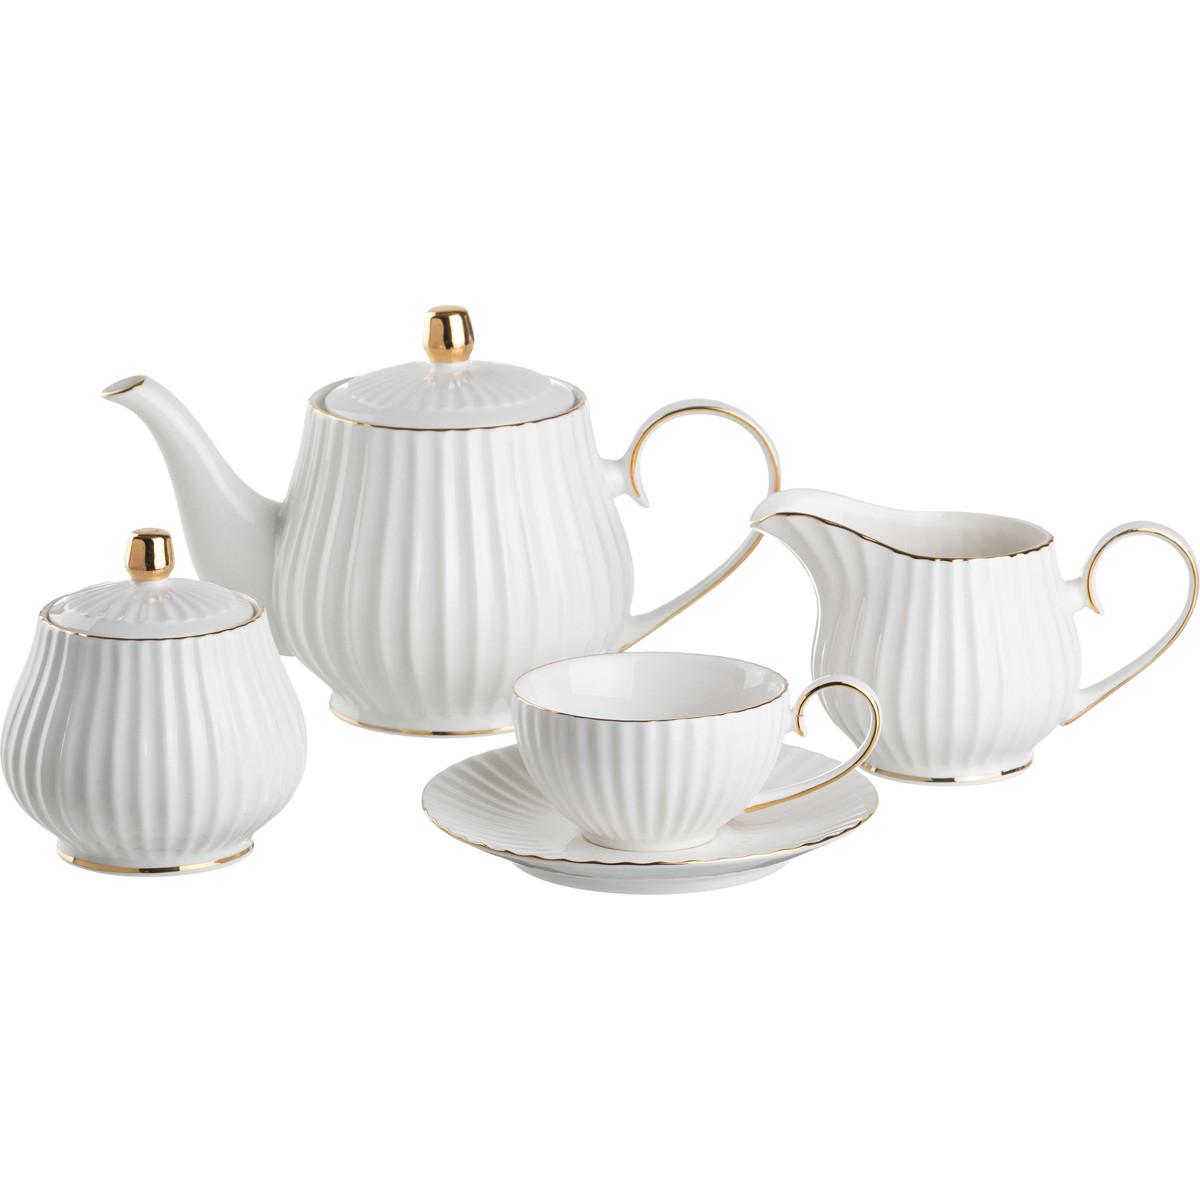 {} Lefard Чайный сервиз Livino (Набор) чайный сервиз lefard 760 456